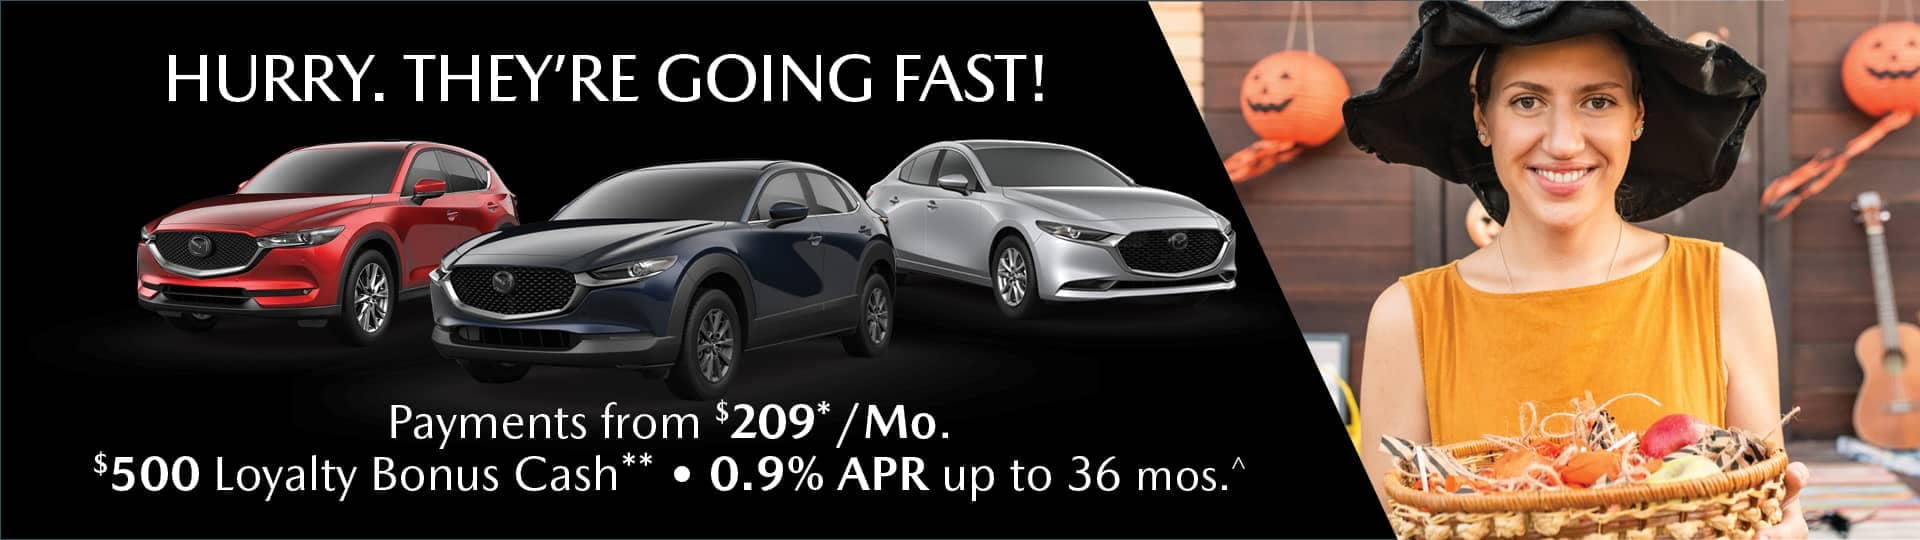 hurry going fast .9% apr $500 loyalty bonus cash